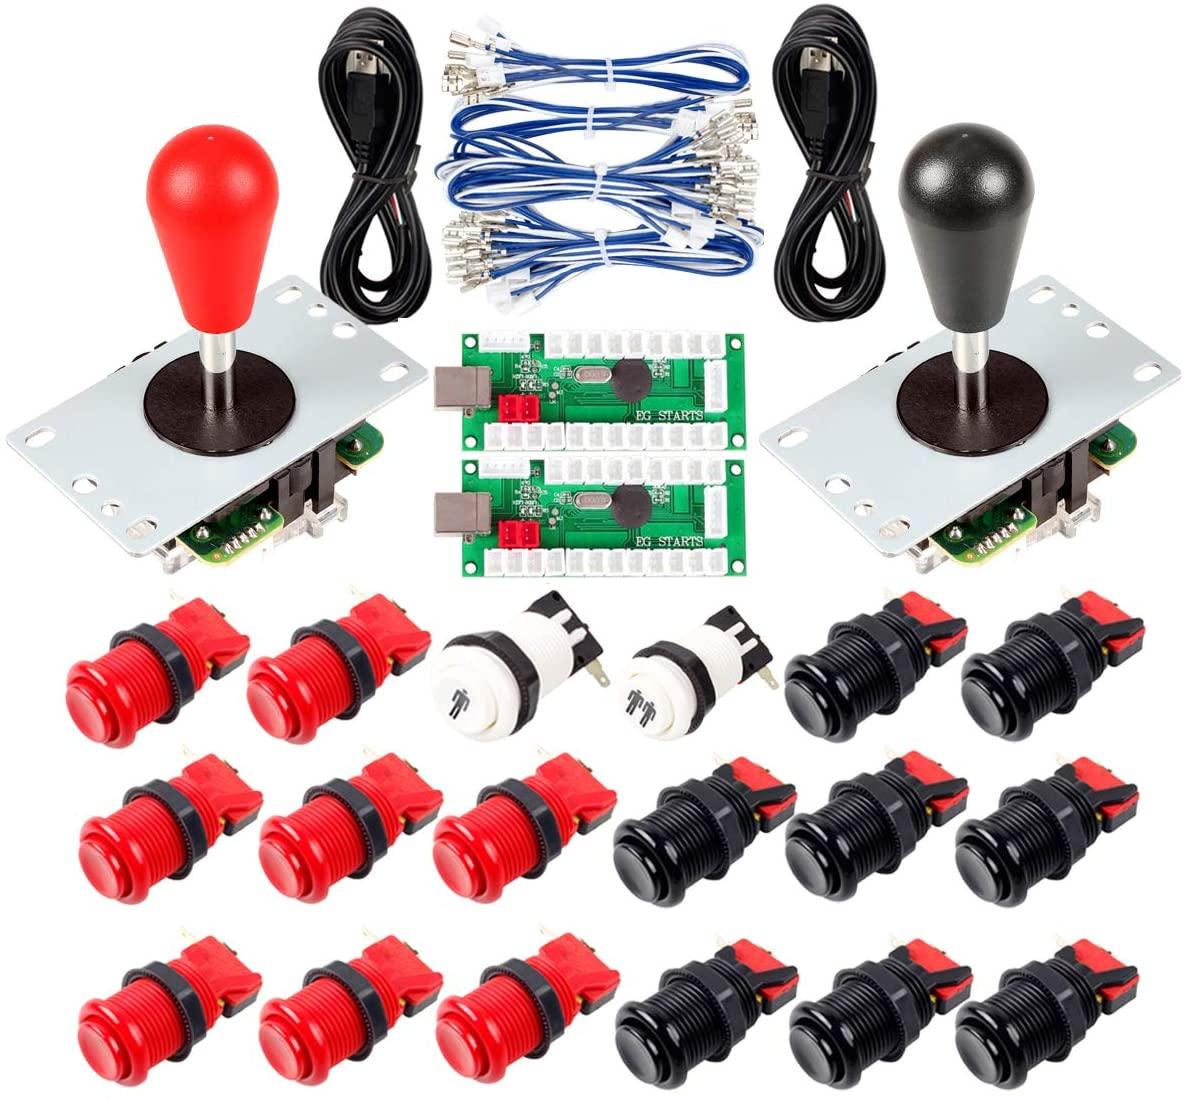 Avisiri 2 Player Arcade Joystick DIY Parts 2X USB Encoder + 2X Elliptical Joystick Hanlde + 18x American Style Arcade Buttons for PC, MAME, Raspberry Pi, Windows (Red & Black)